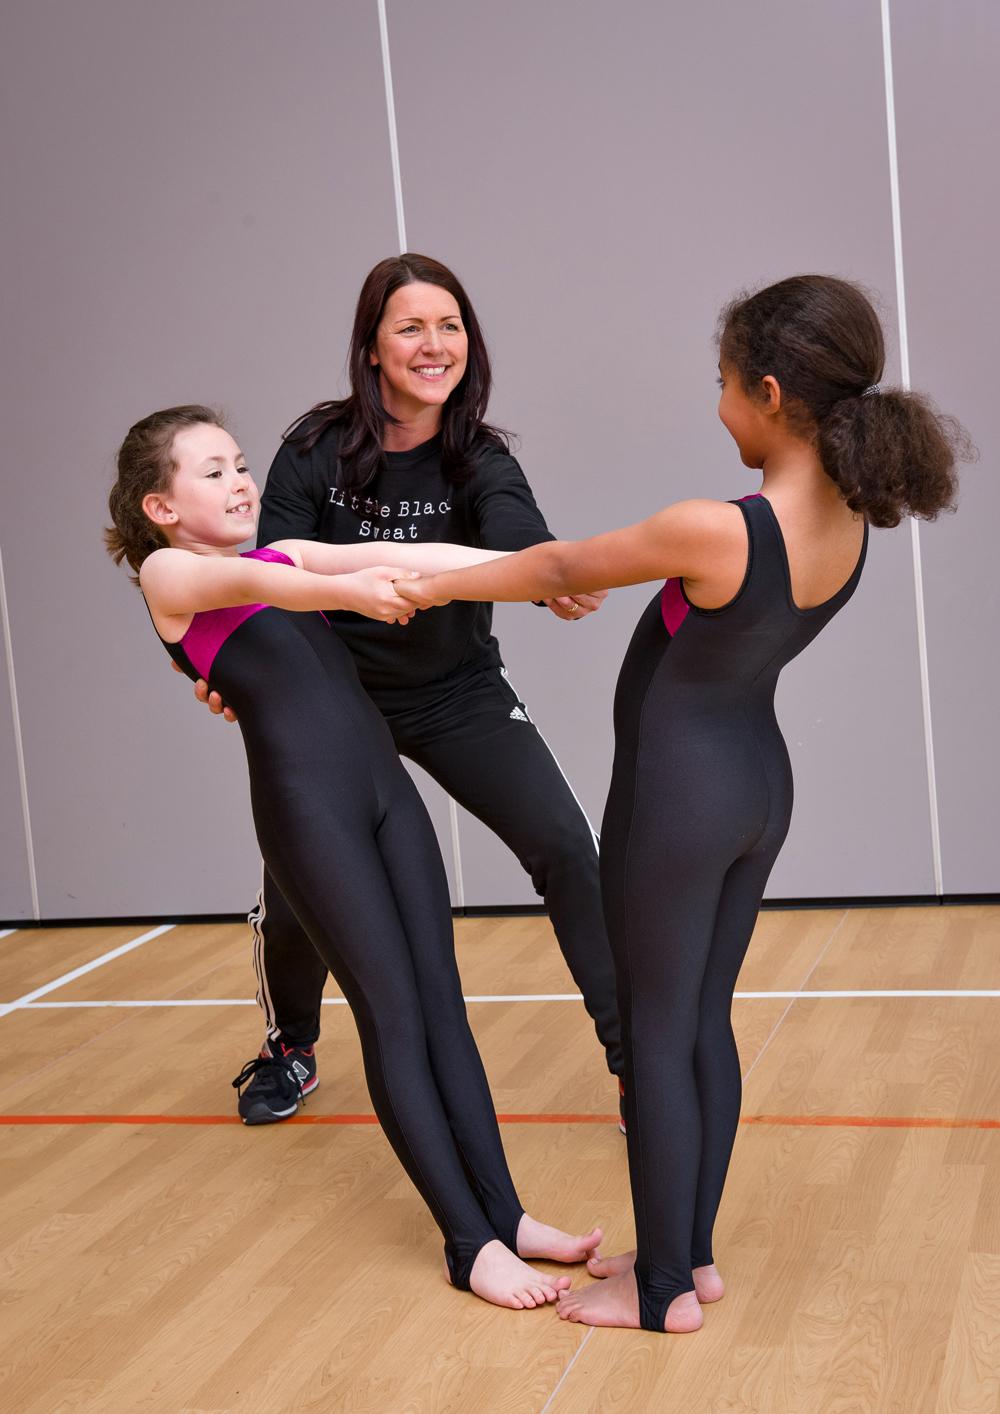 Mrs Bradley teaching two girls gymnastics